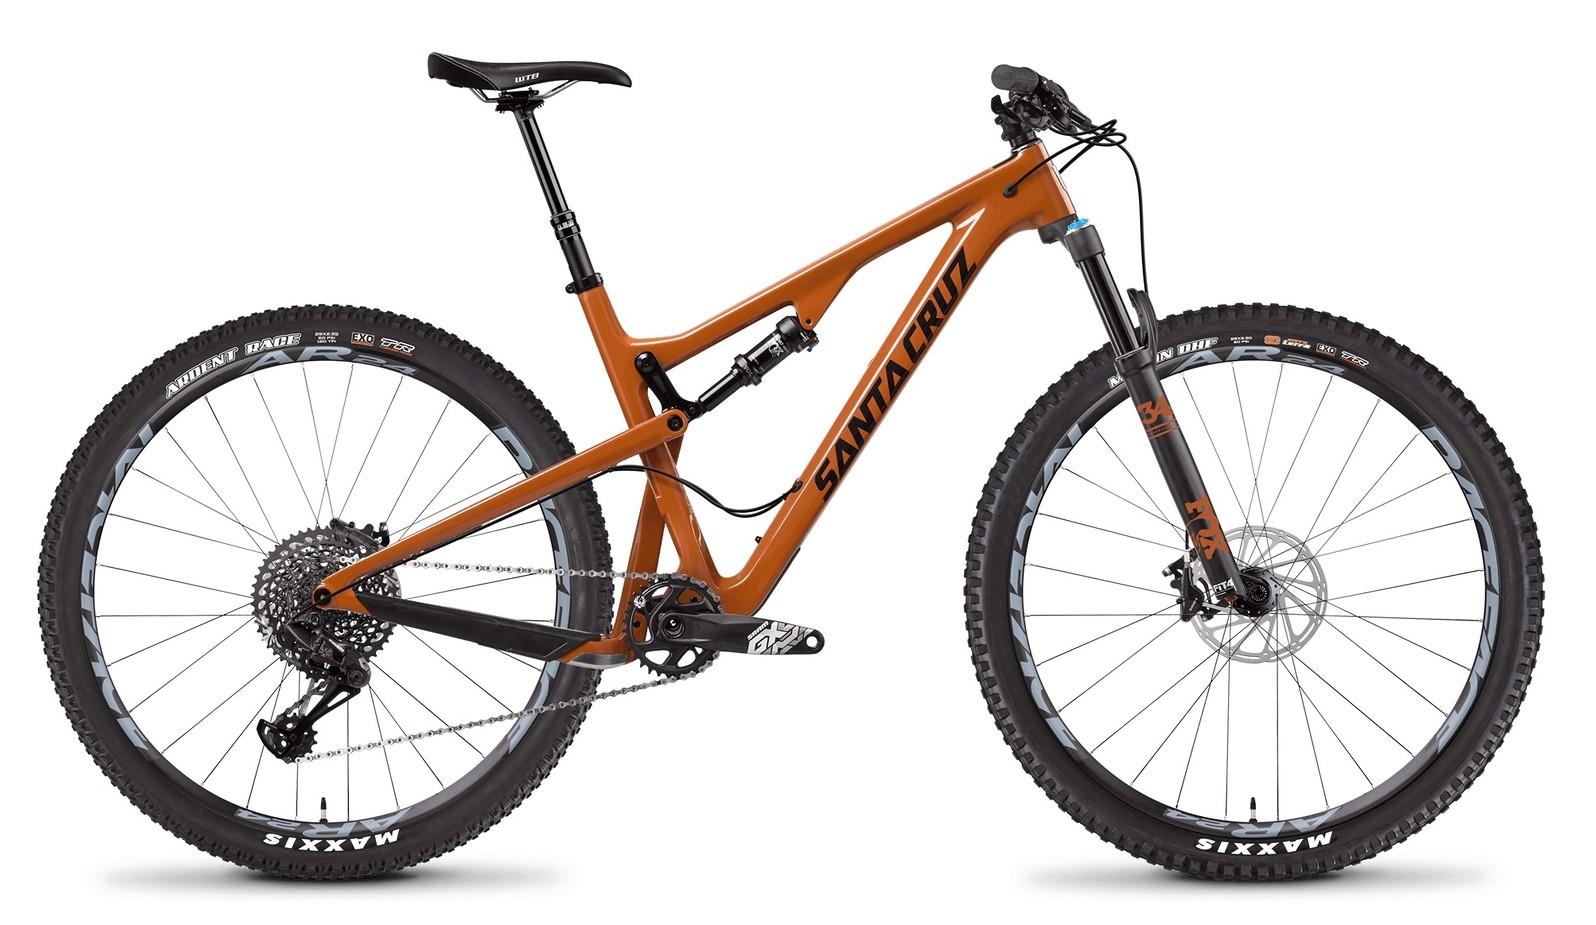 Santa Cruz Tallboy Carbon S Gloss Rust and Black